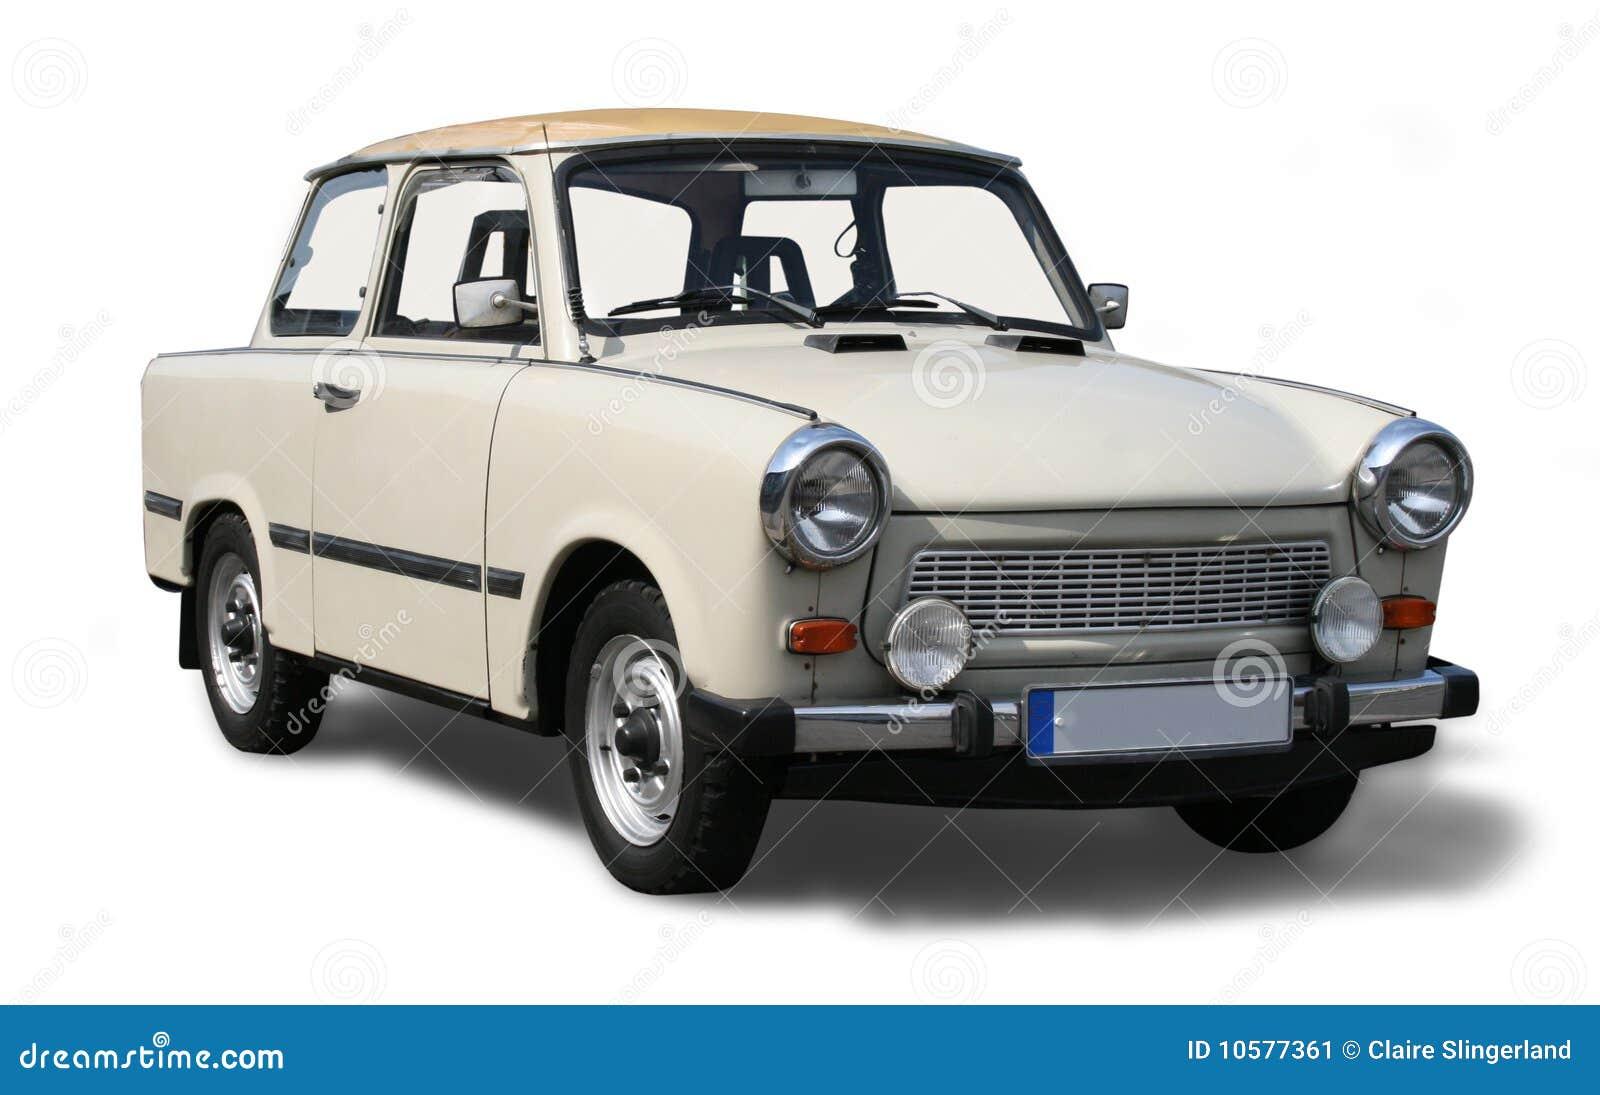 Old Eastern European car. stock image. Image of vintage - 10577361